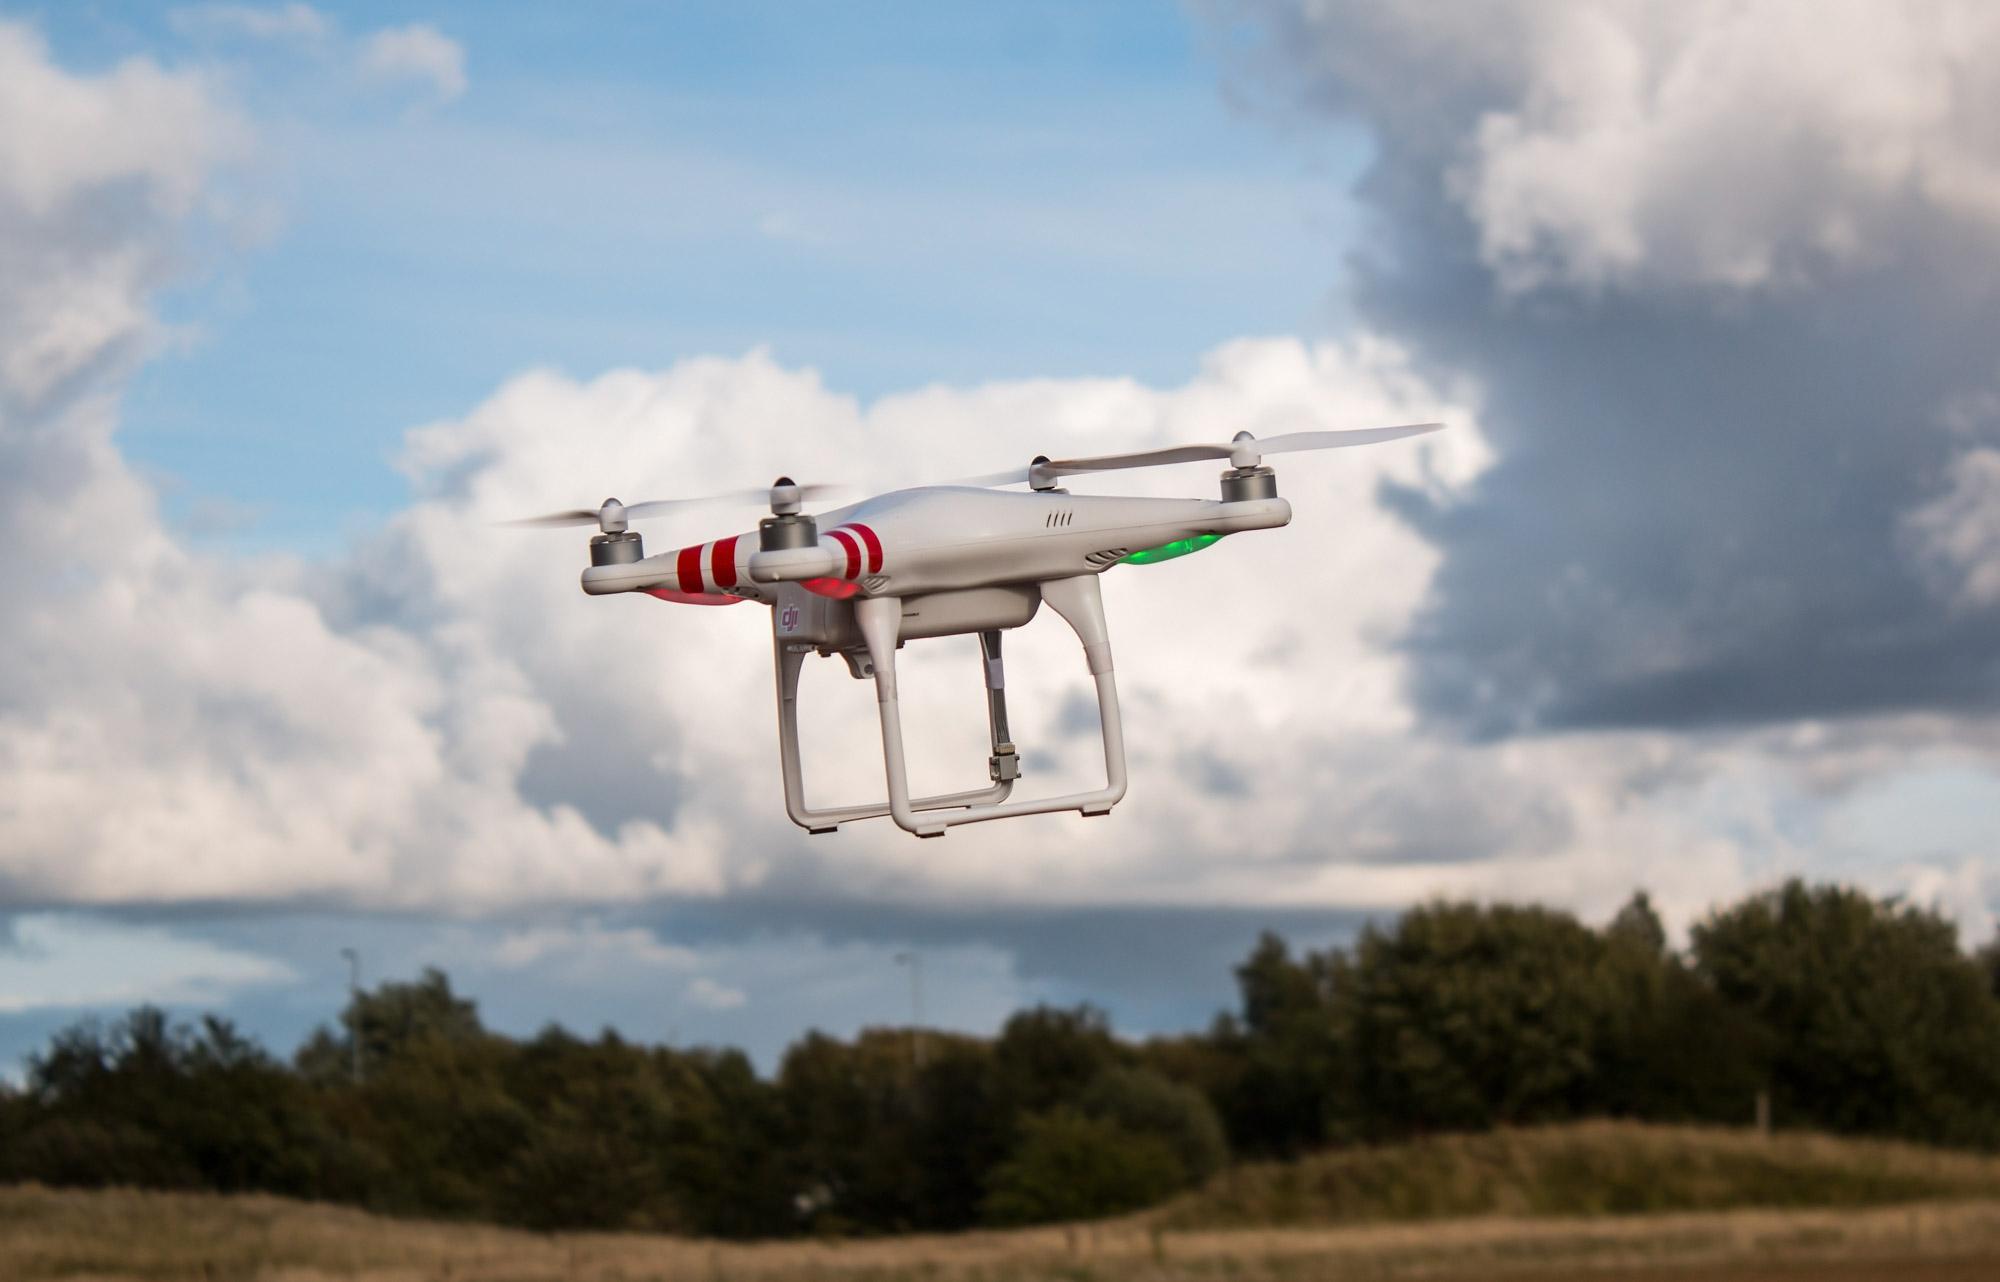 Dji Phantom drone quadcopter in flight